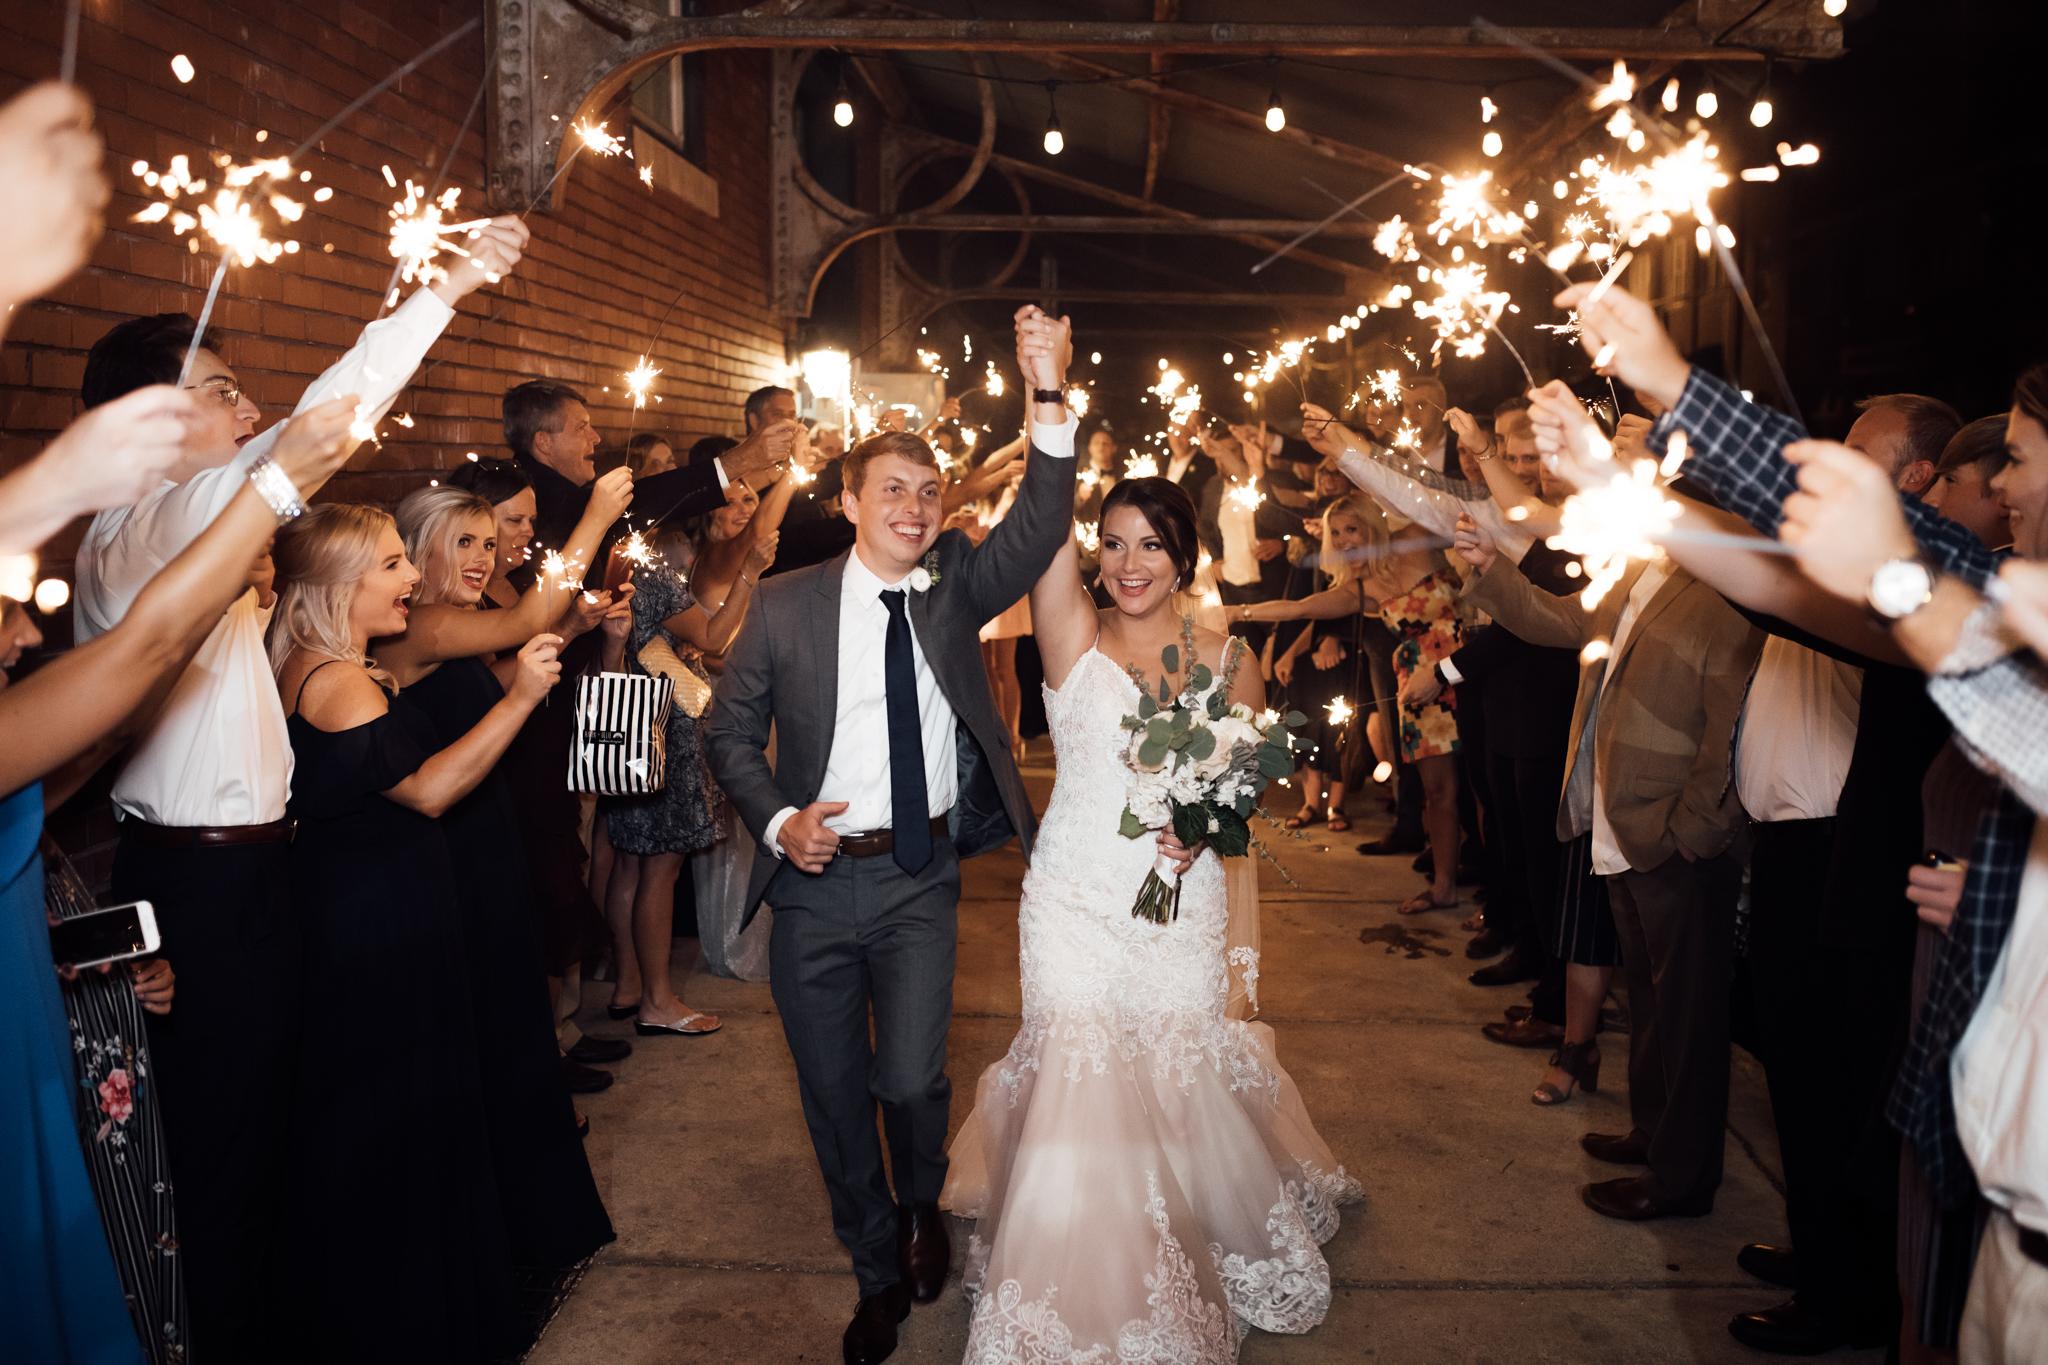 409smain-downtown-memphis-wedding-venue-thewarmtharoundyou (242 of 243).jpg